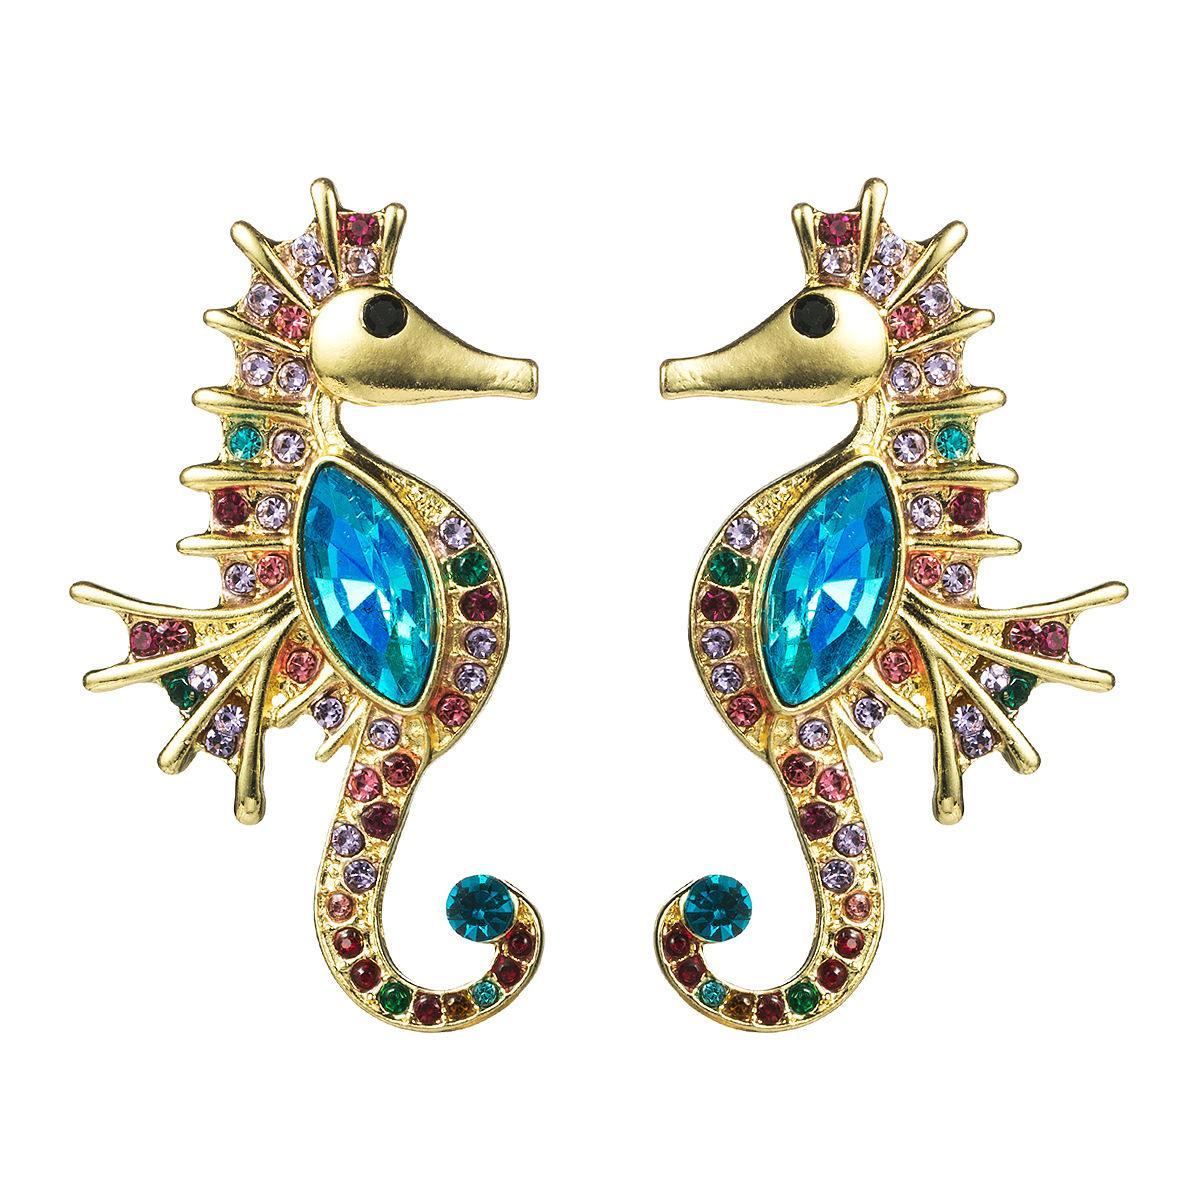 Mode créative exagérée Seahorse Diamond Glass diamant strass plein oreilles diamant boucle d'oreille de mode féminine